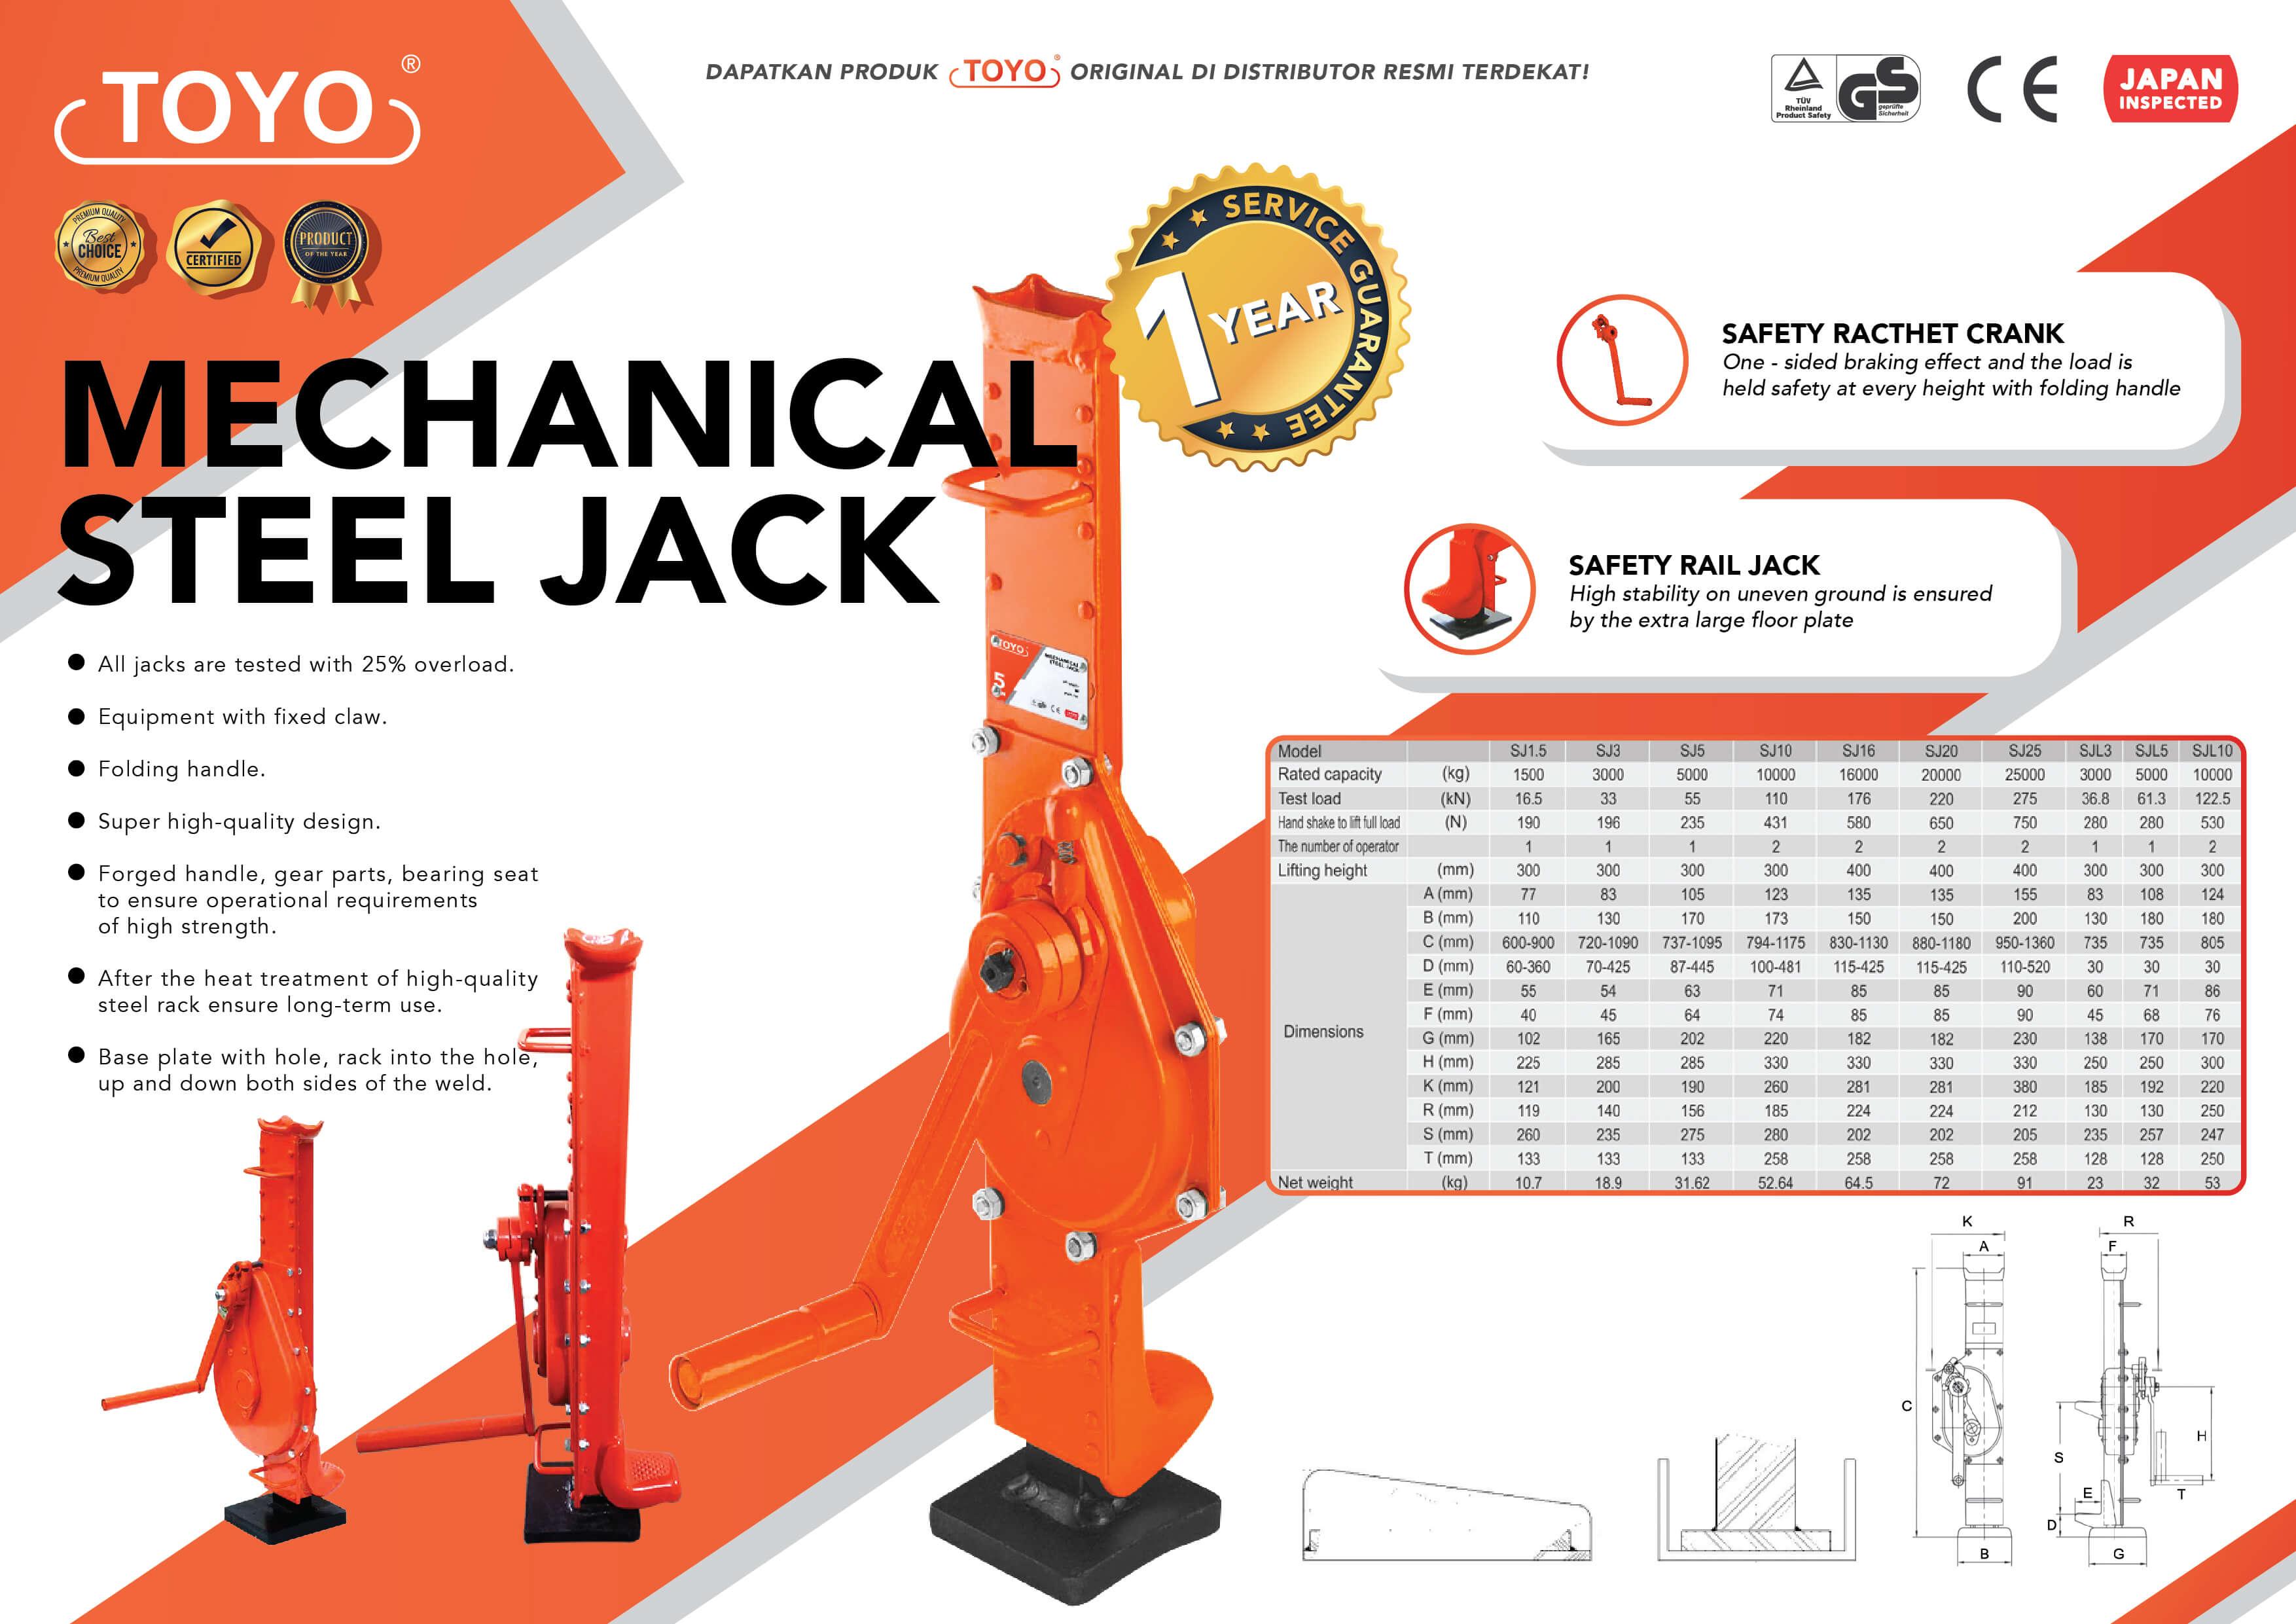 Spesifikasi Detail Mechanical Steel Jack Toyo Original